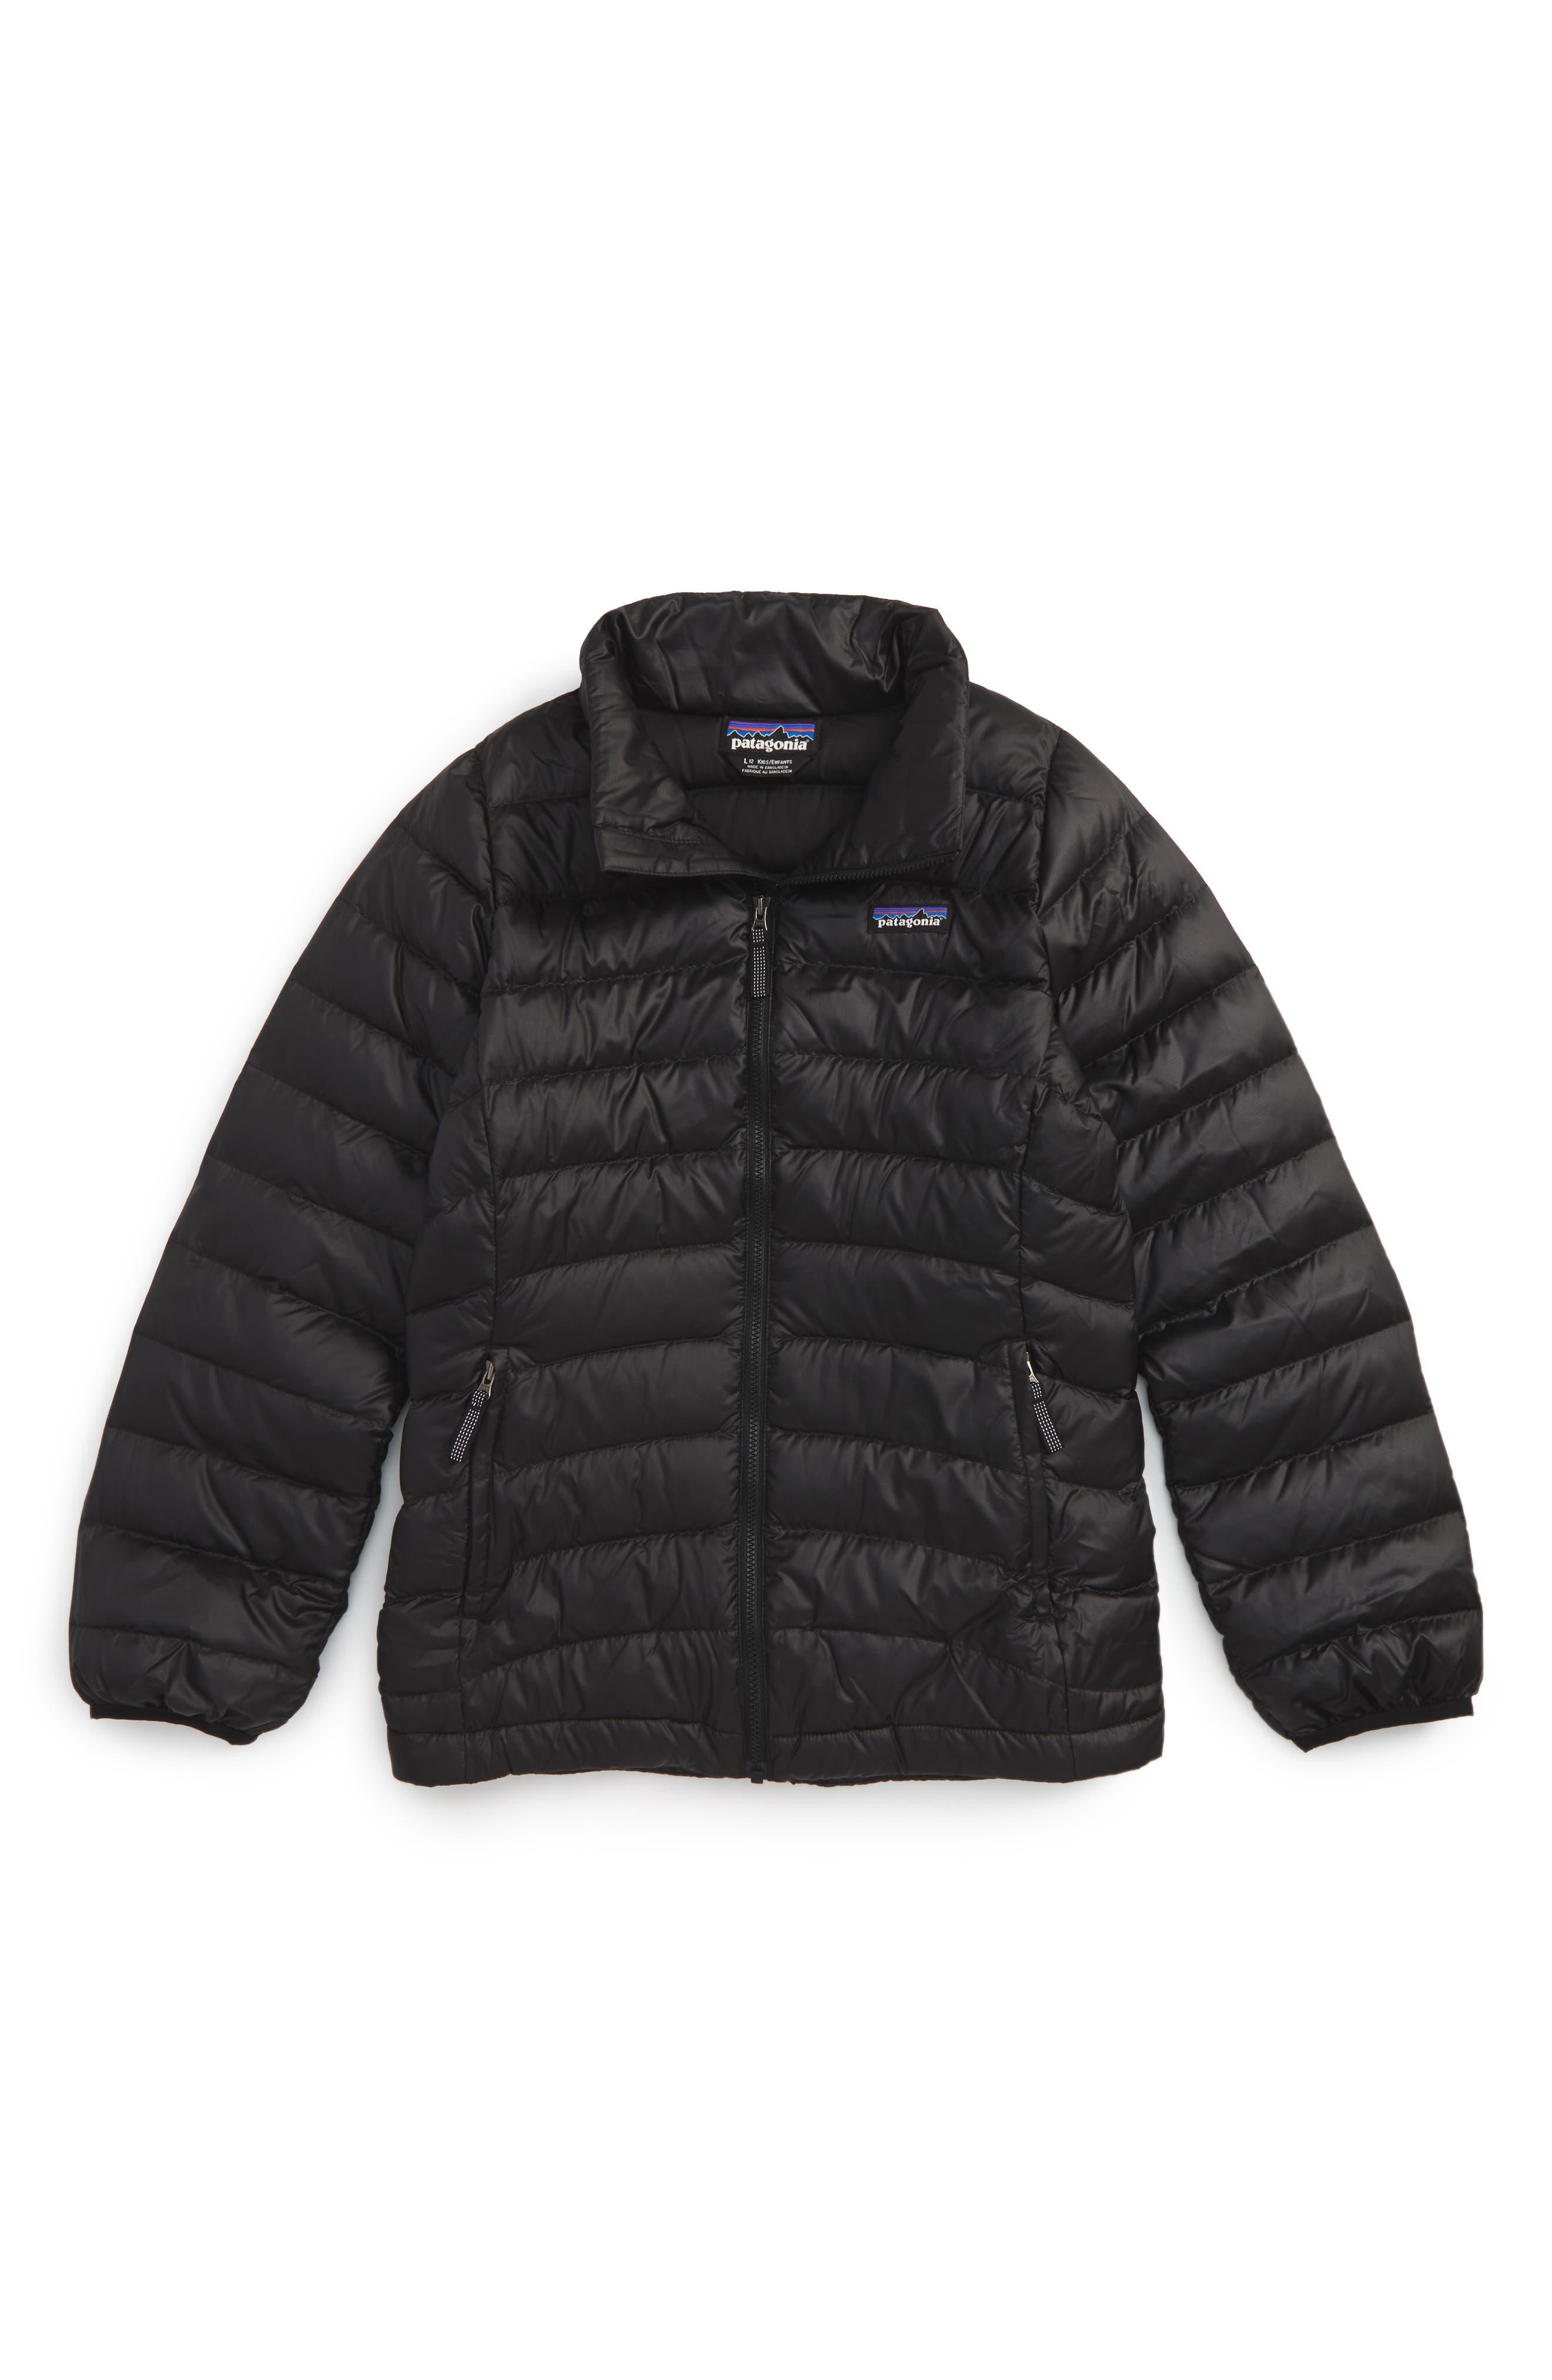 girls coats jackets outerwear rain fleece hood nordstrom #2: